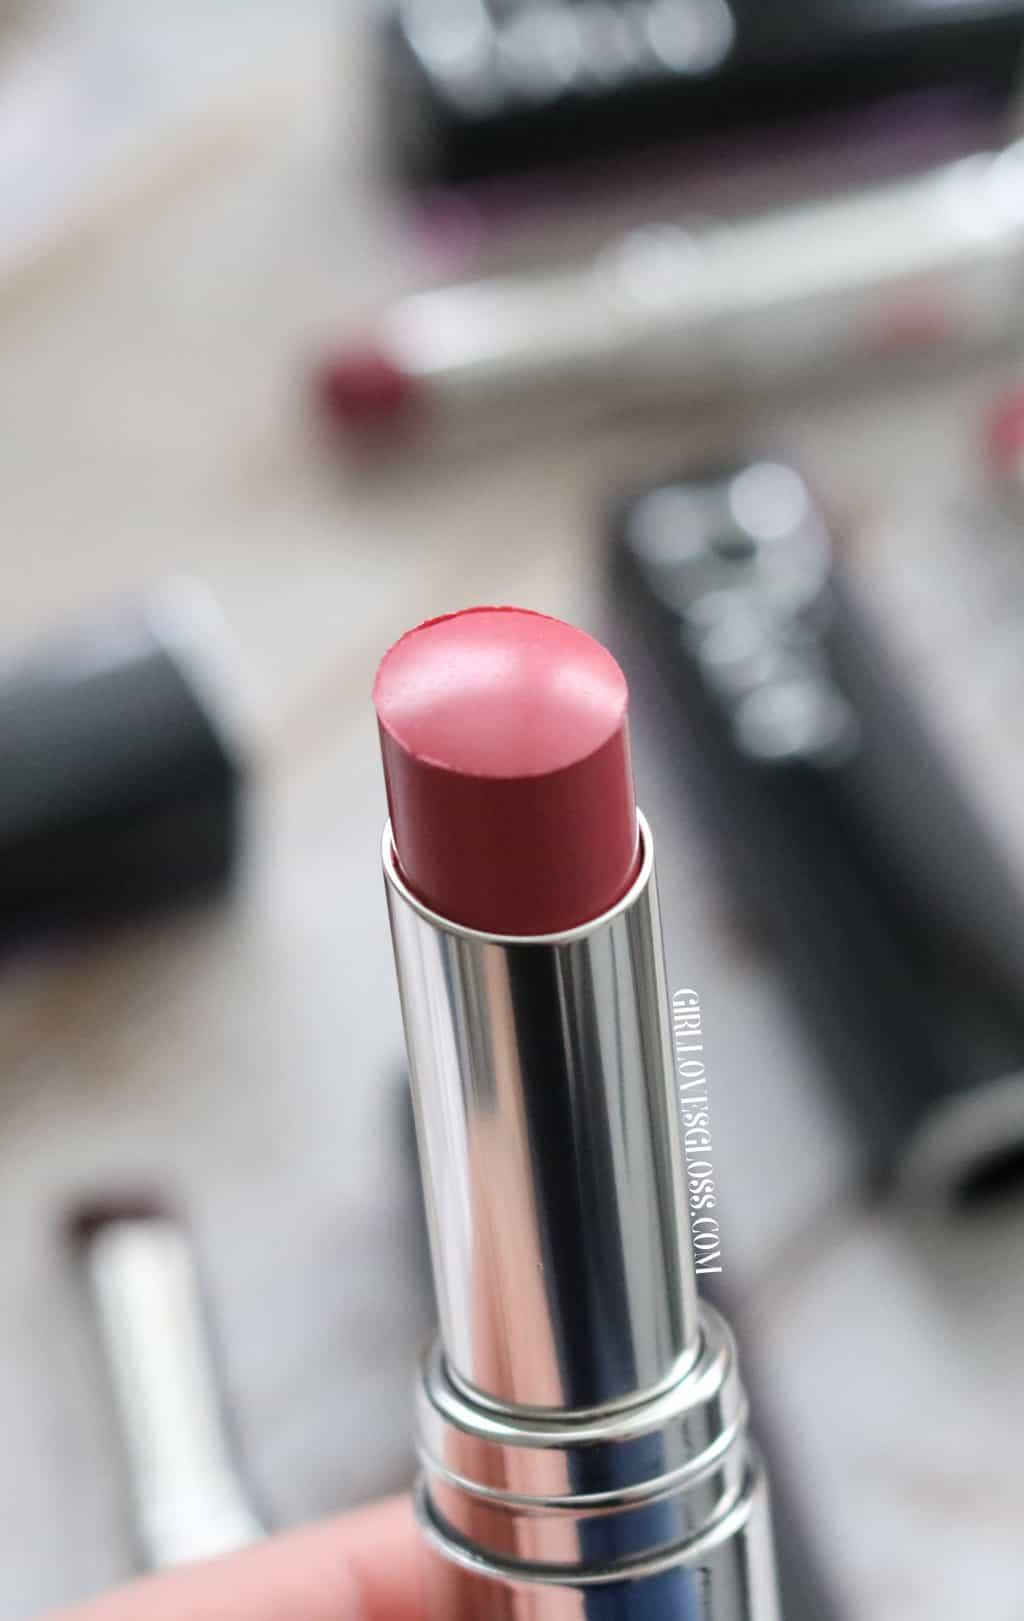 Dior Lacquer Sticks Review